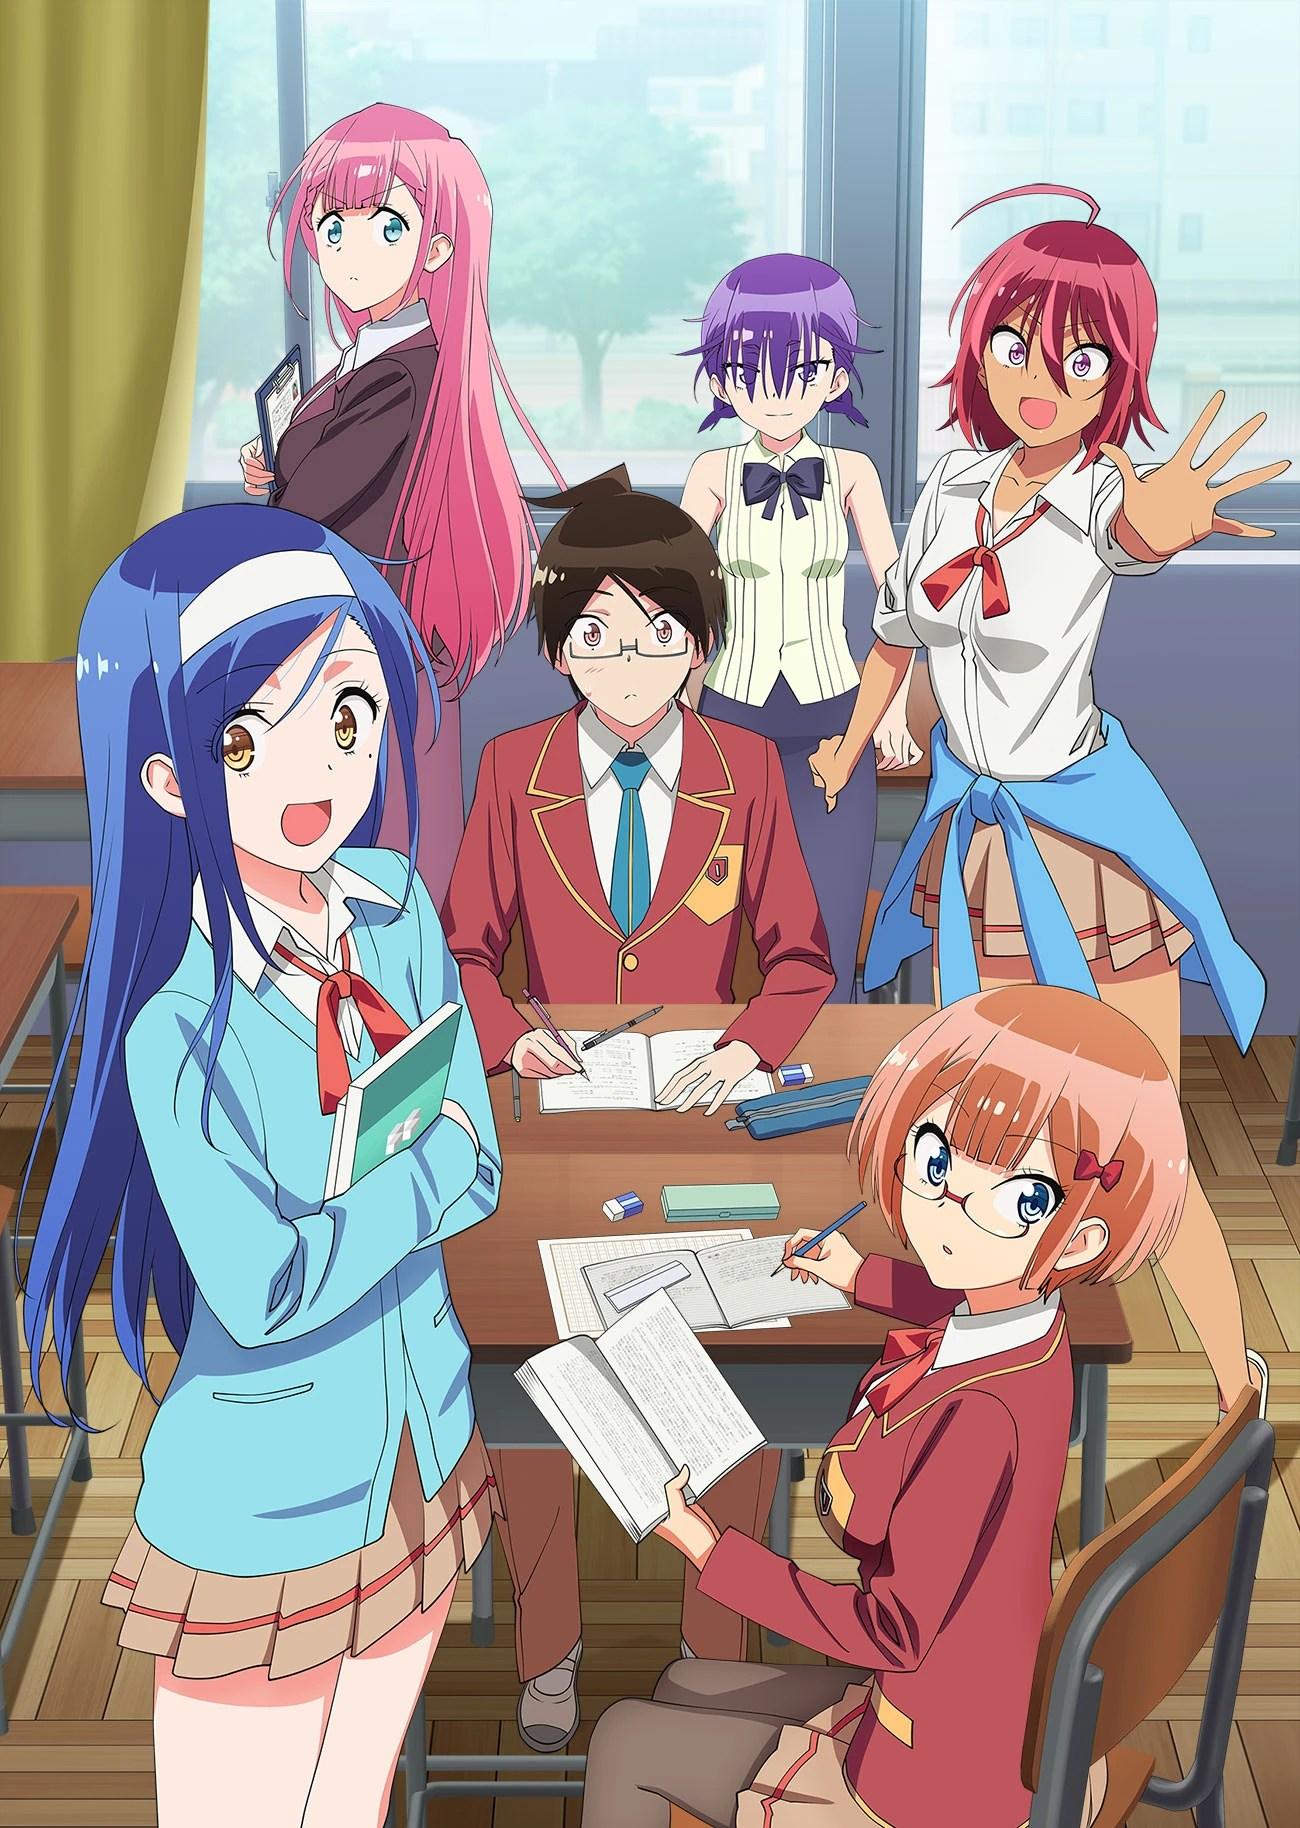 We Never Learn Anime : never, learn, anime, Never, Learn, (Anime), Fandom